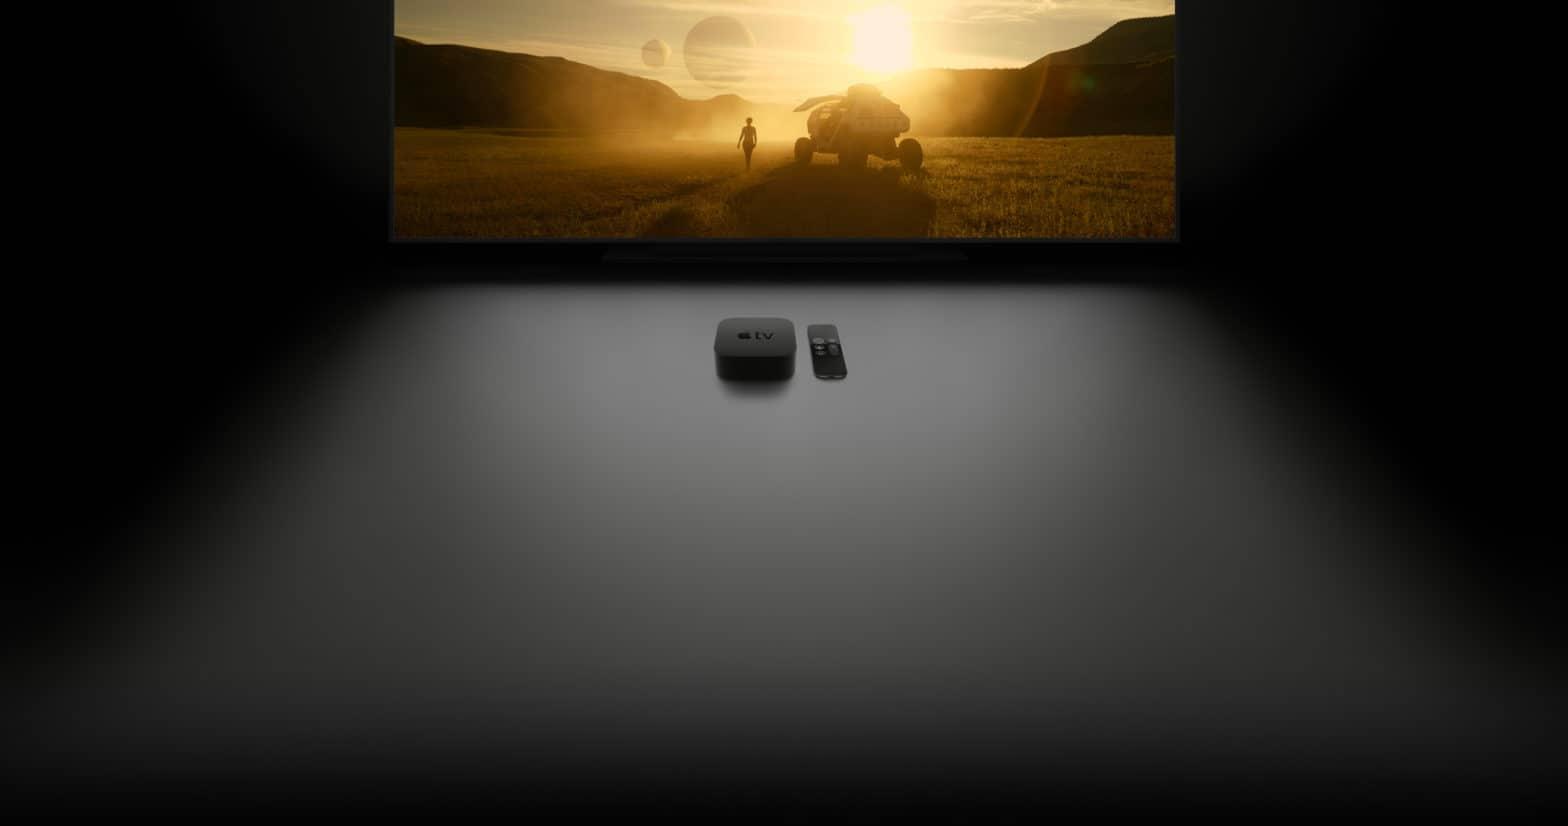 Apple TV with TV on screen not sleeping